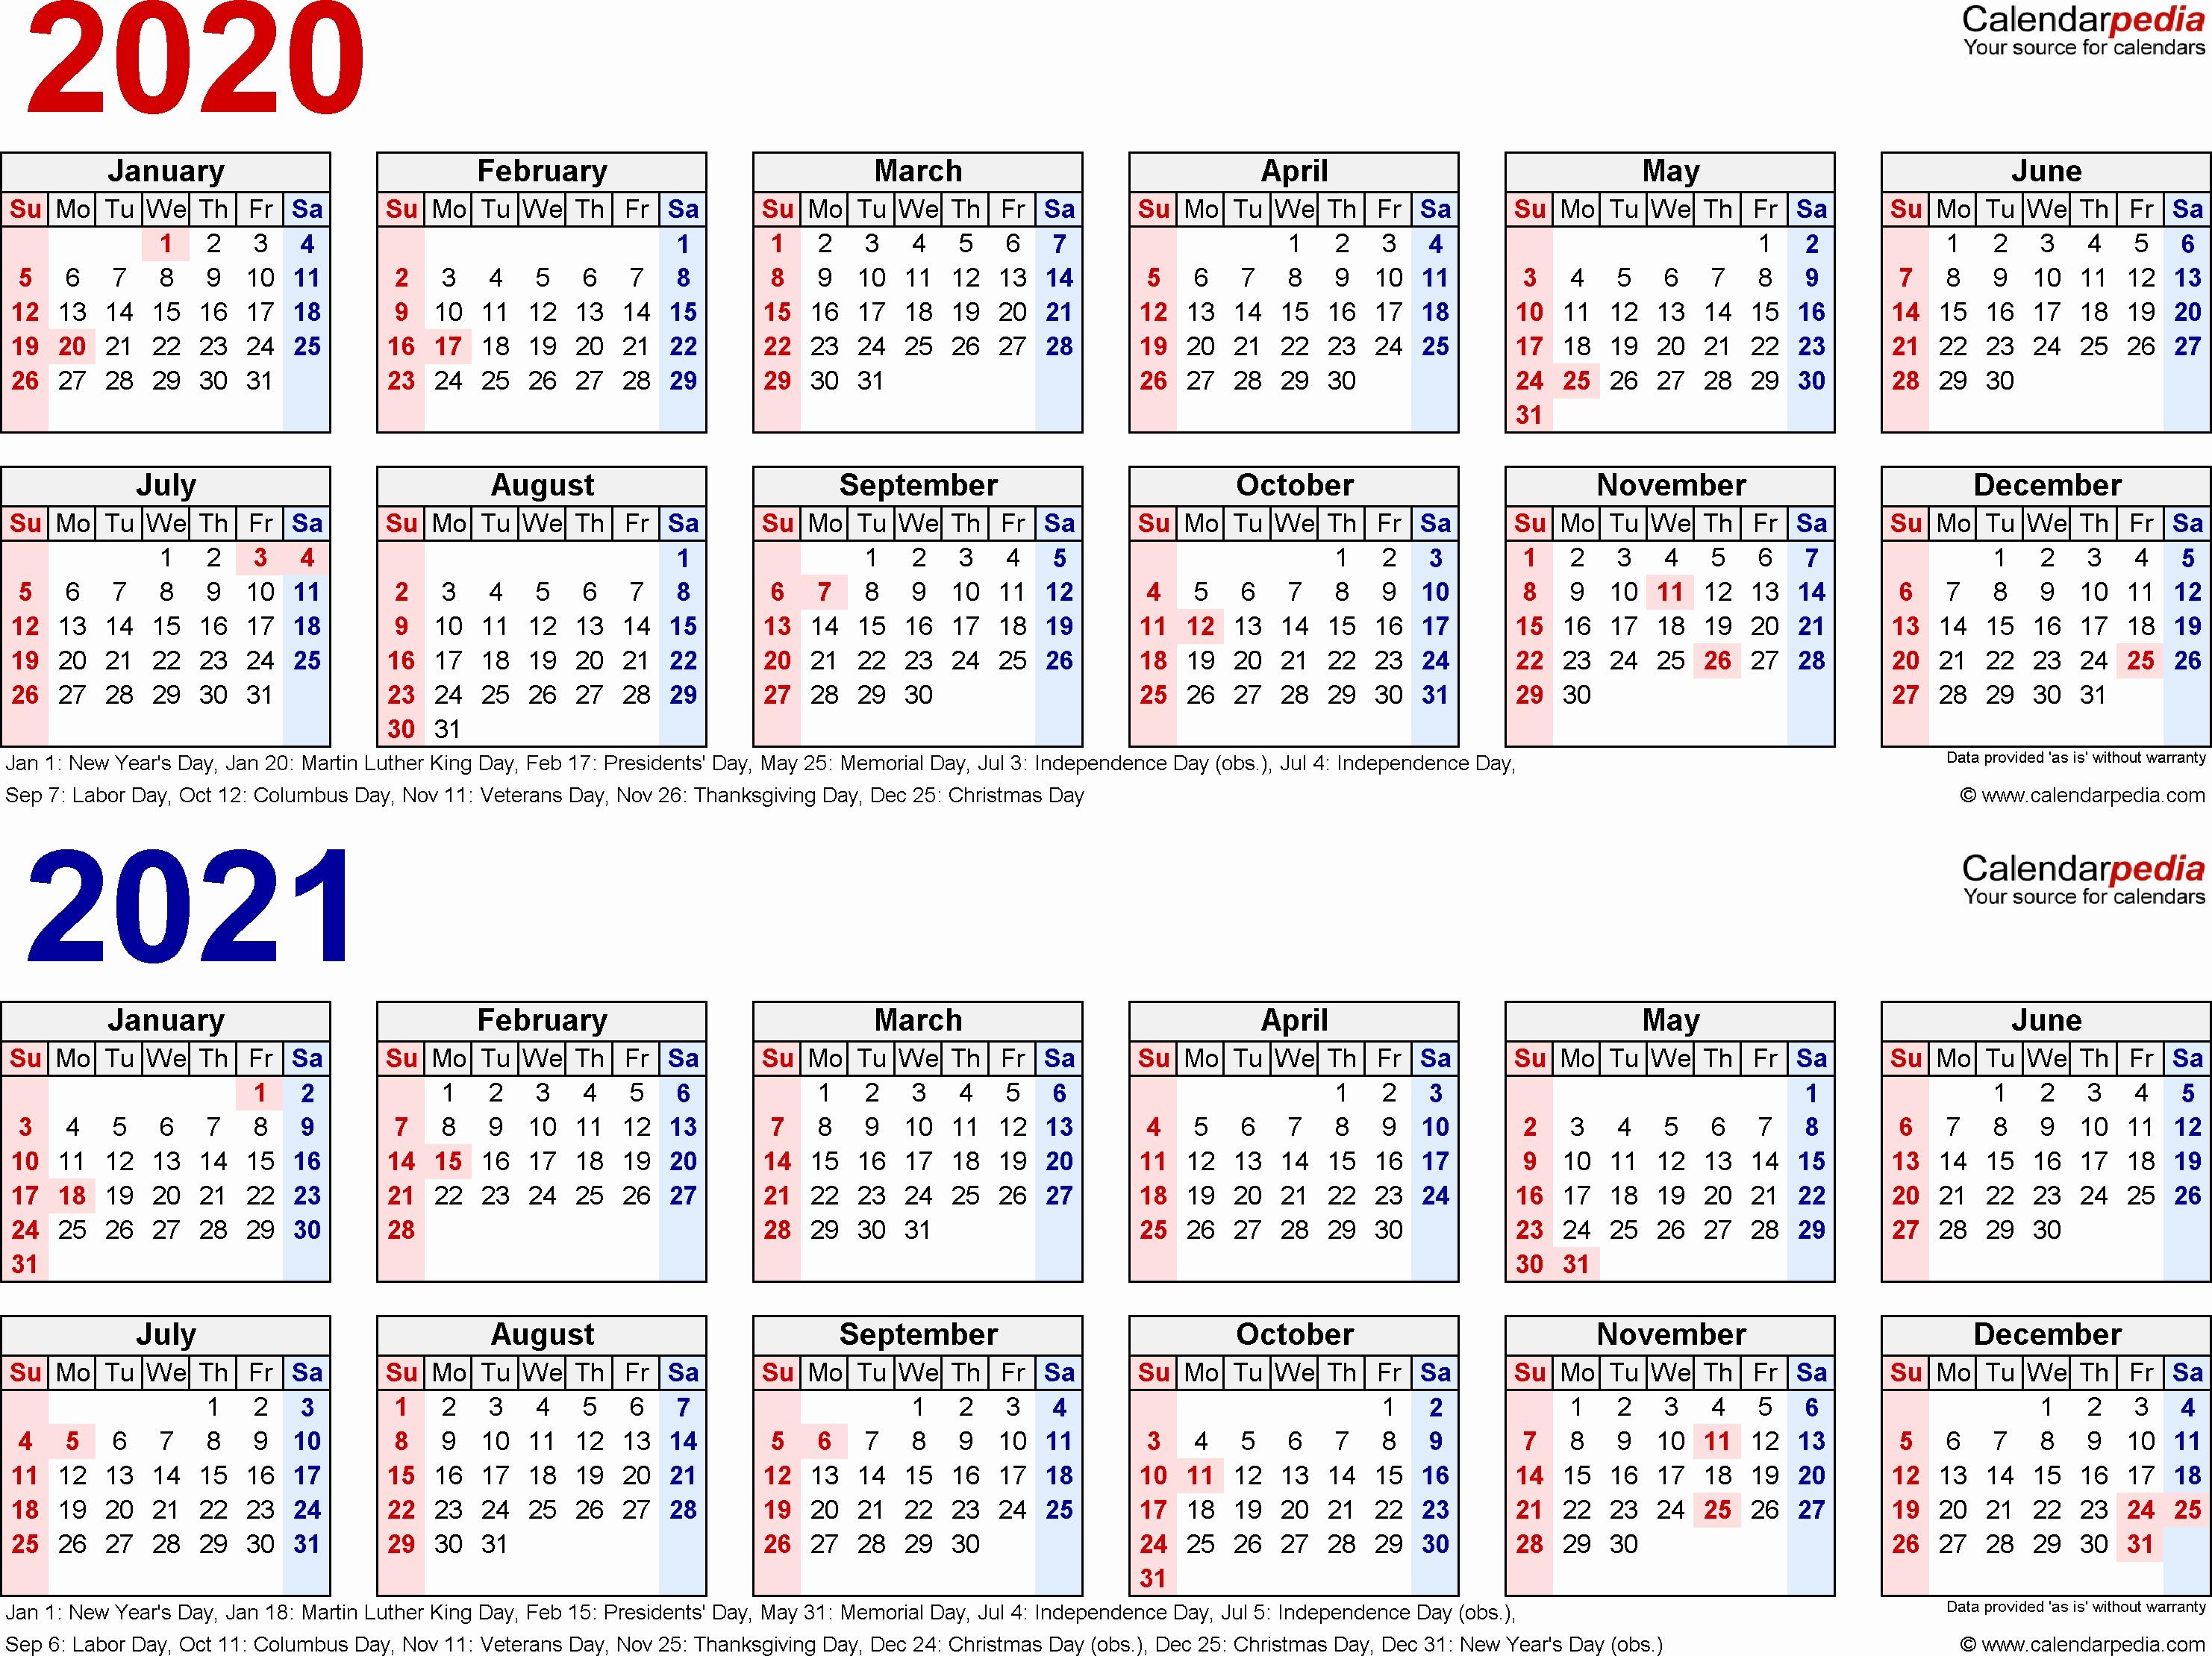 Government Of Canada Holiday Calendar 2019 2020 2020 2021